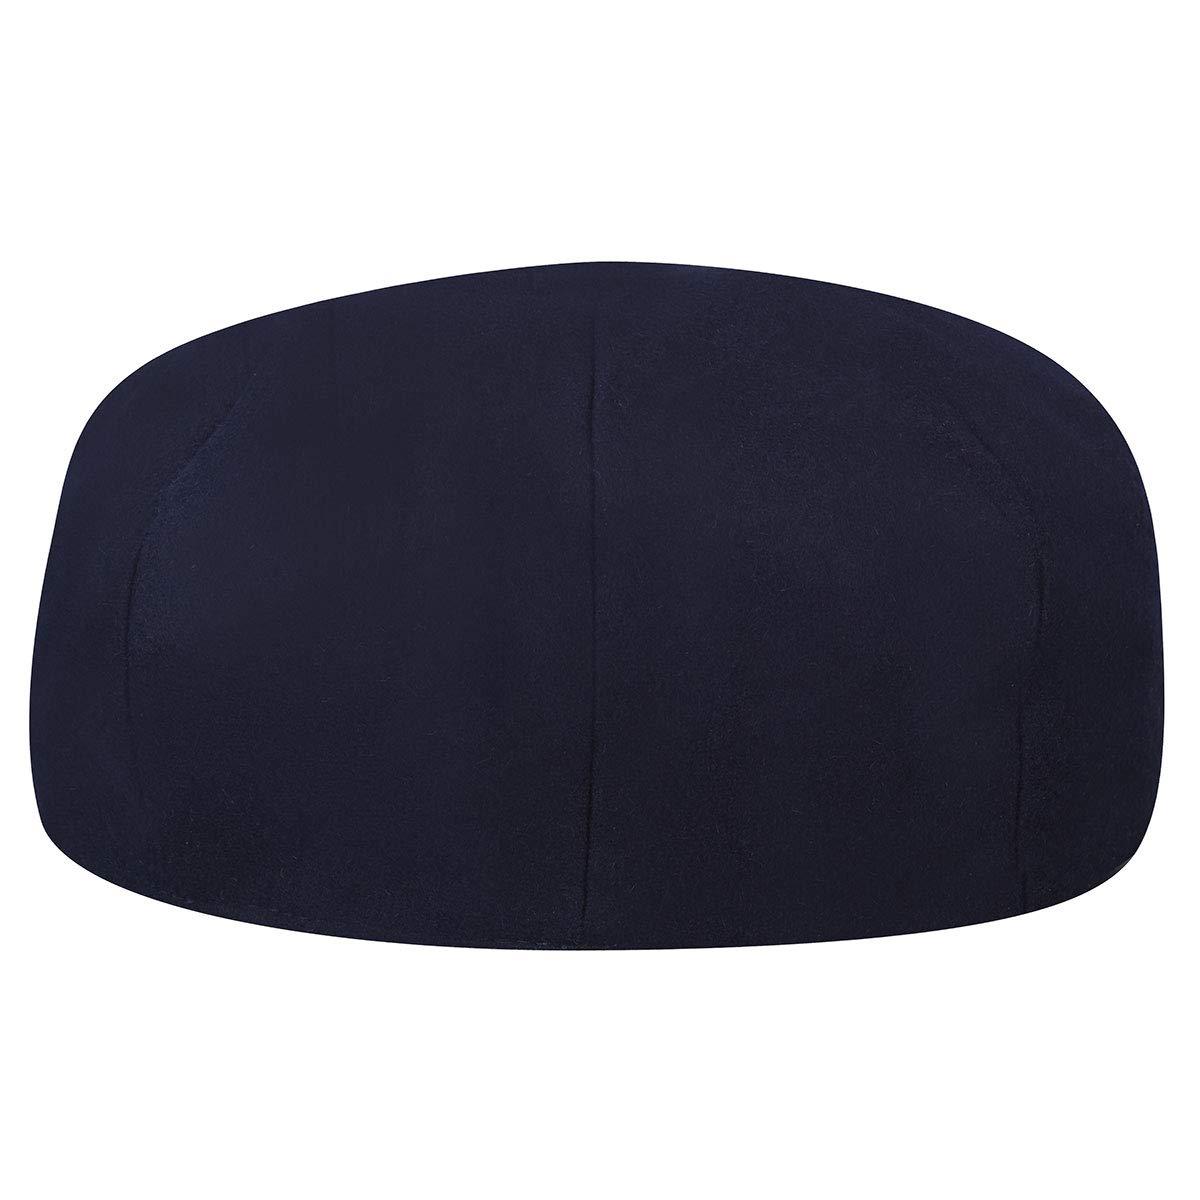 7900b9d8 Country Gentleman Men's Wool Ivy Flat Cap at Amazon Men's Clothing store: